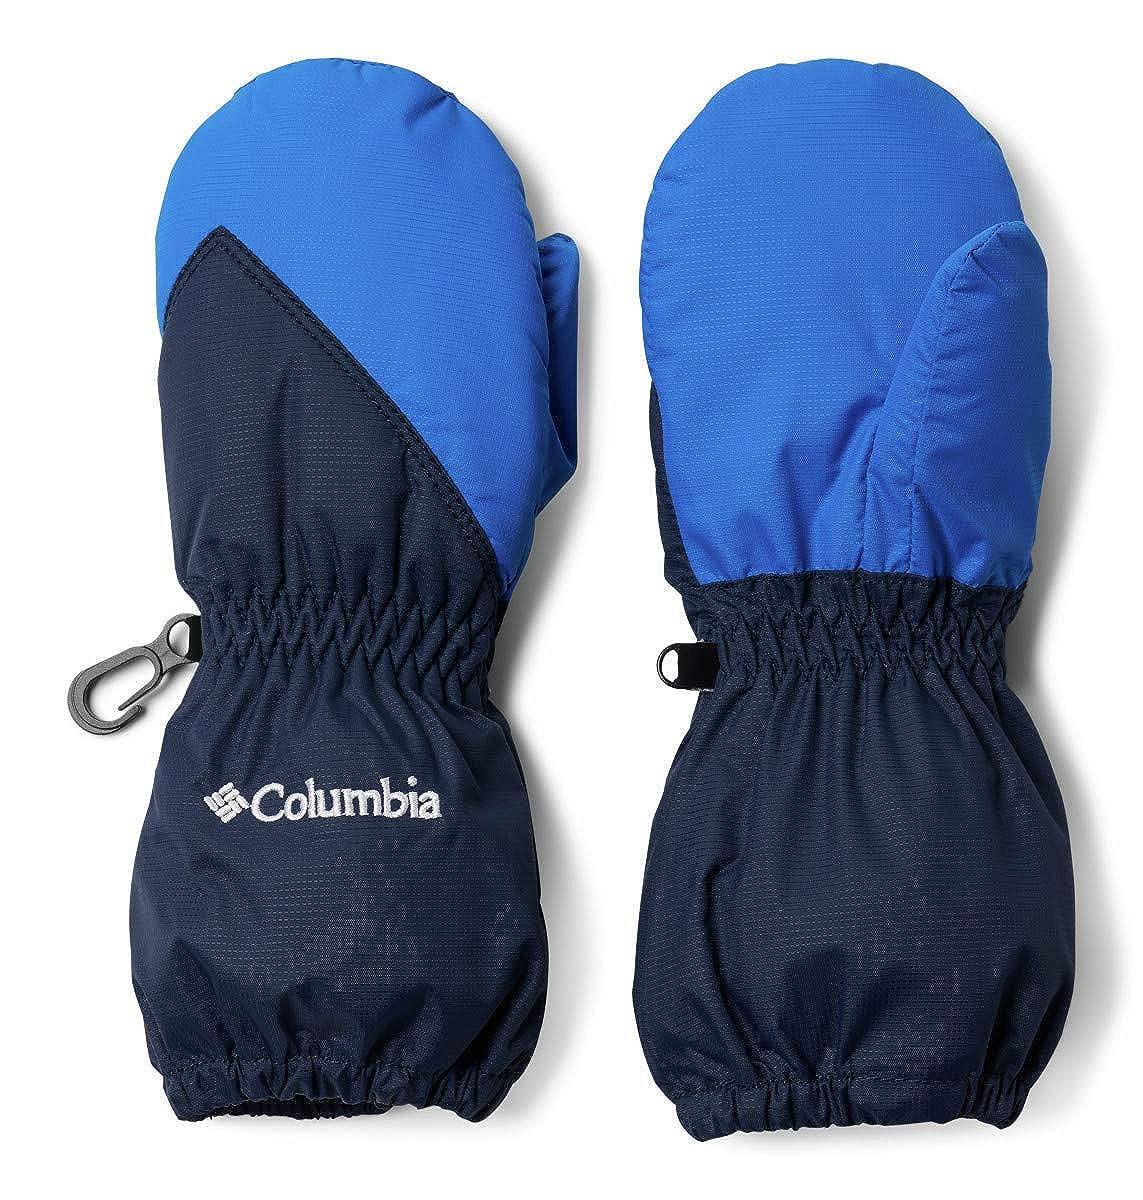 Columbia Toddler Chippewa Long Mitten Accessory